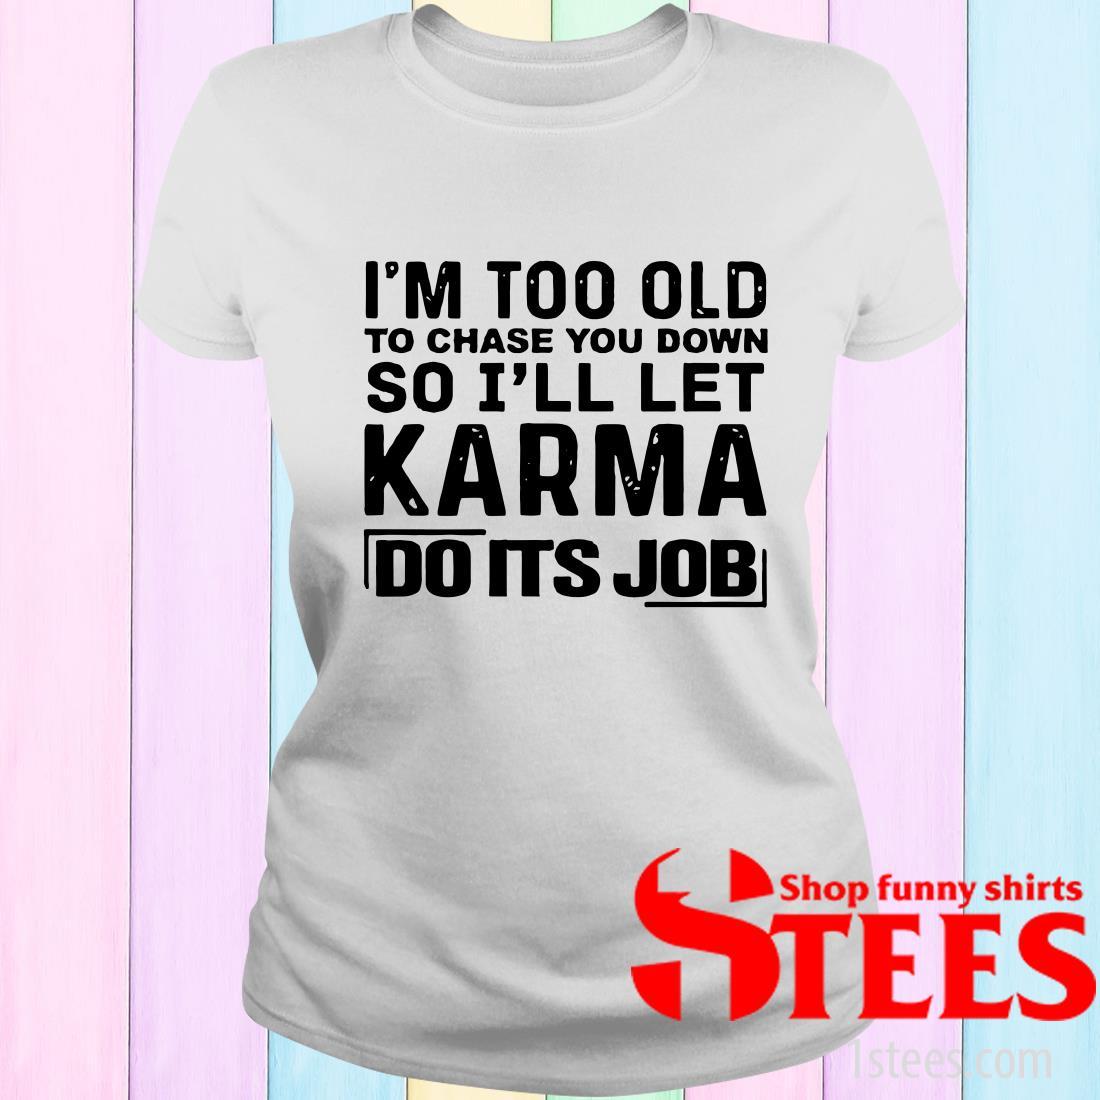 I'll Let Karma Do Its Job T-Shirt